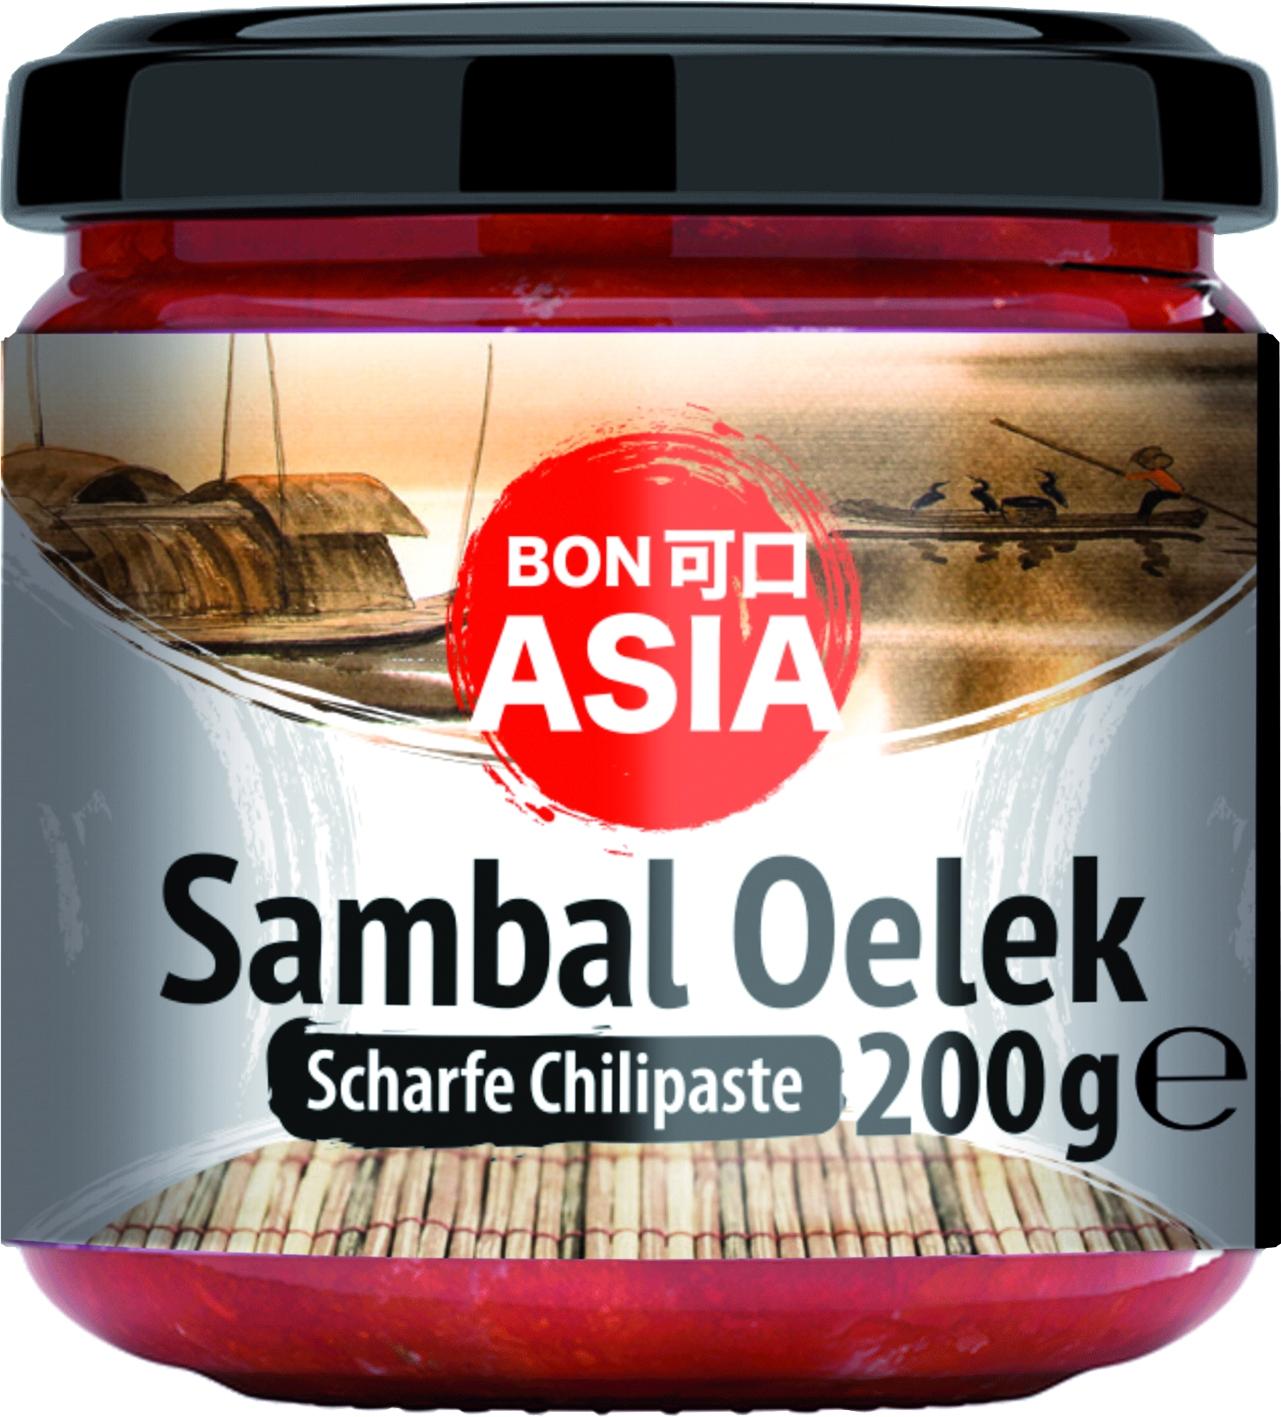 Sambal Olek